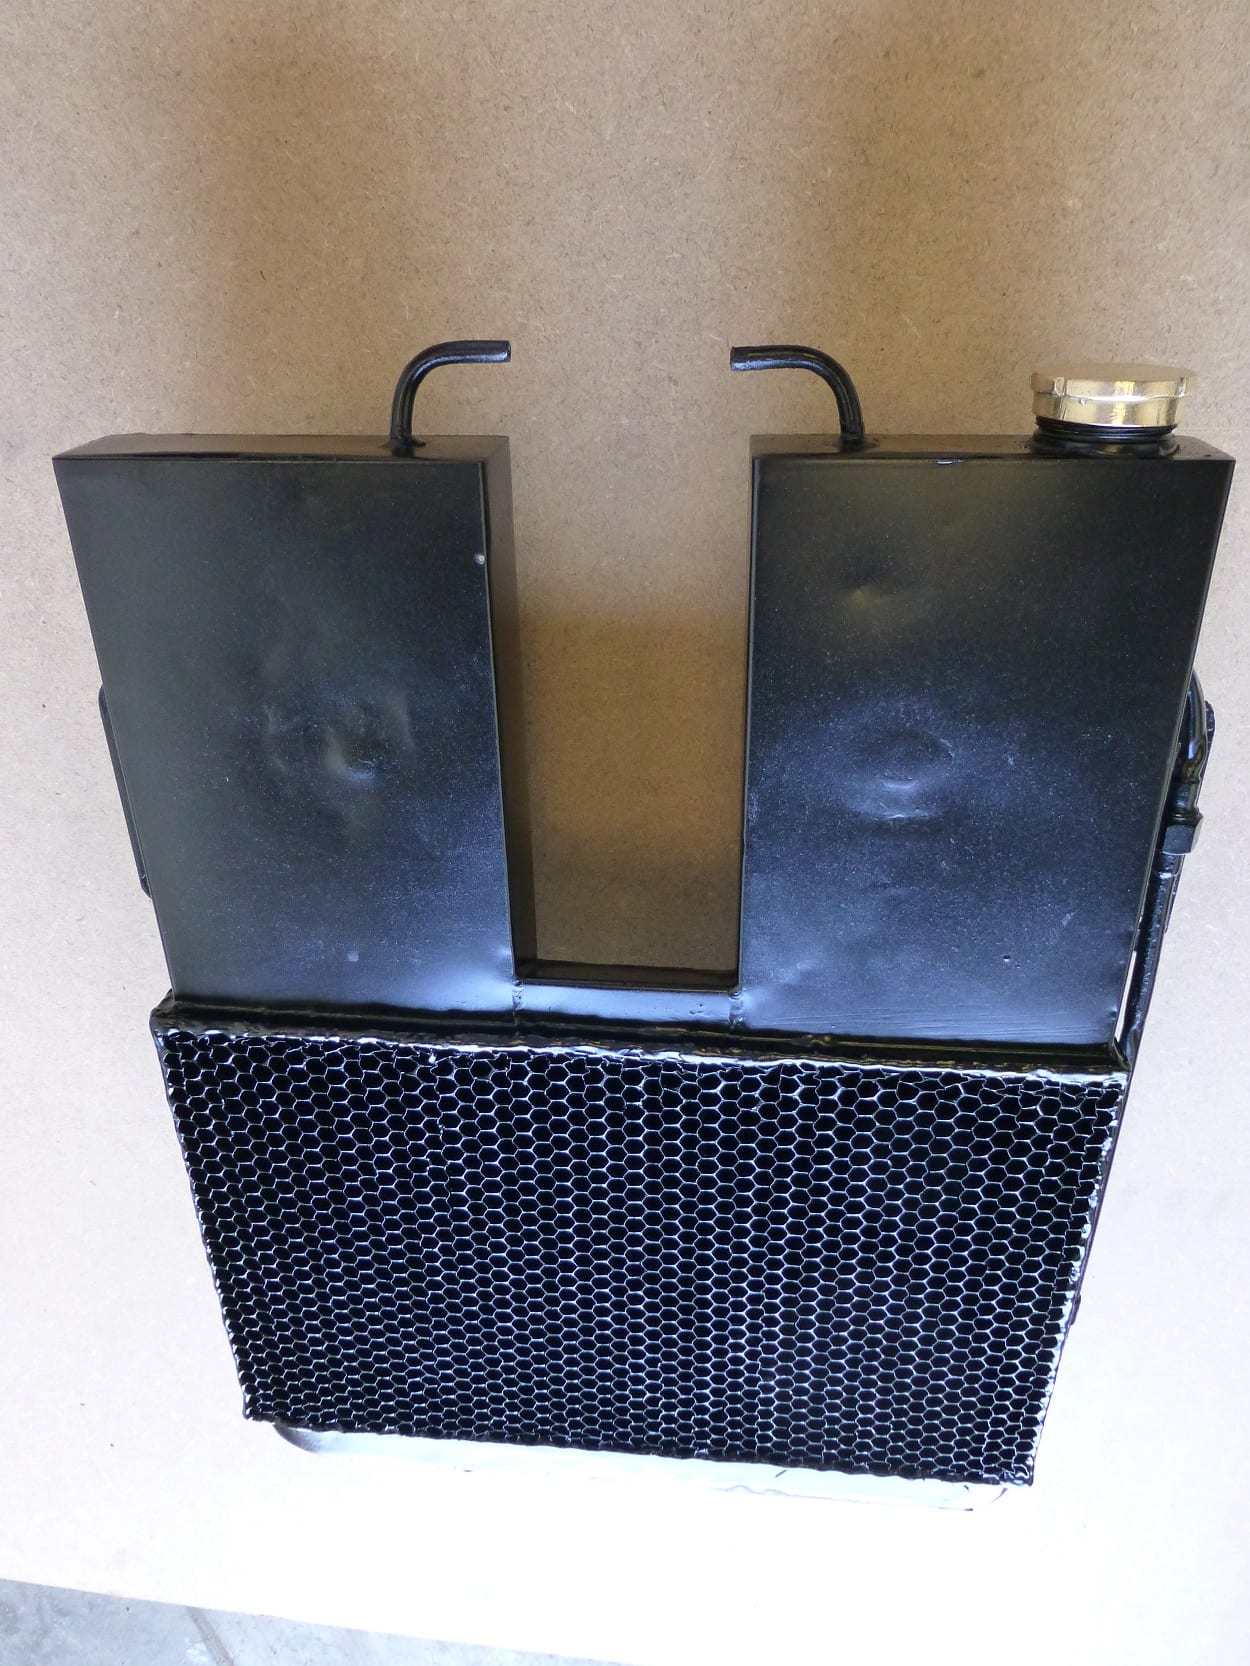 Stevens 3 Wheel Van Radiator Modern Core faced with Original Honeycomb Exeter